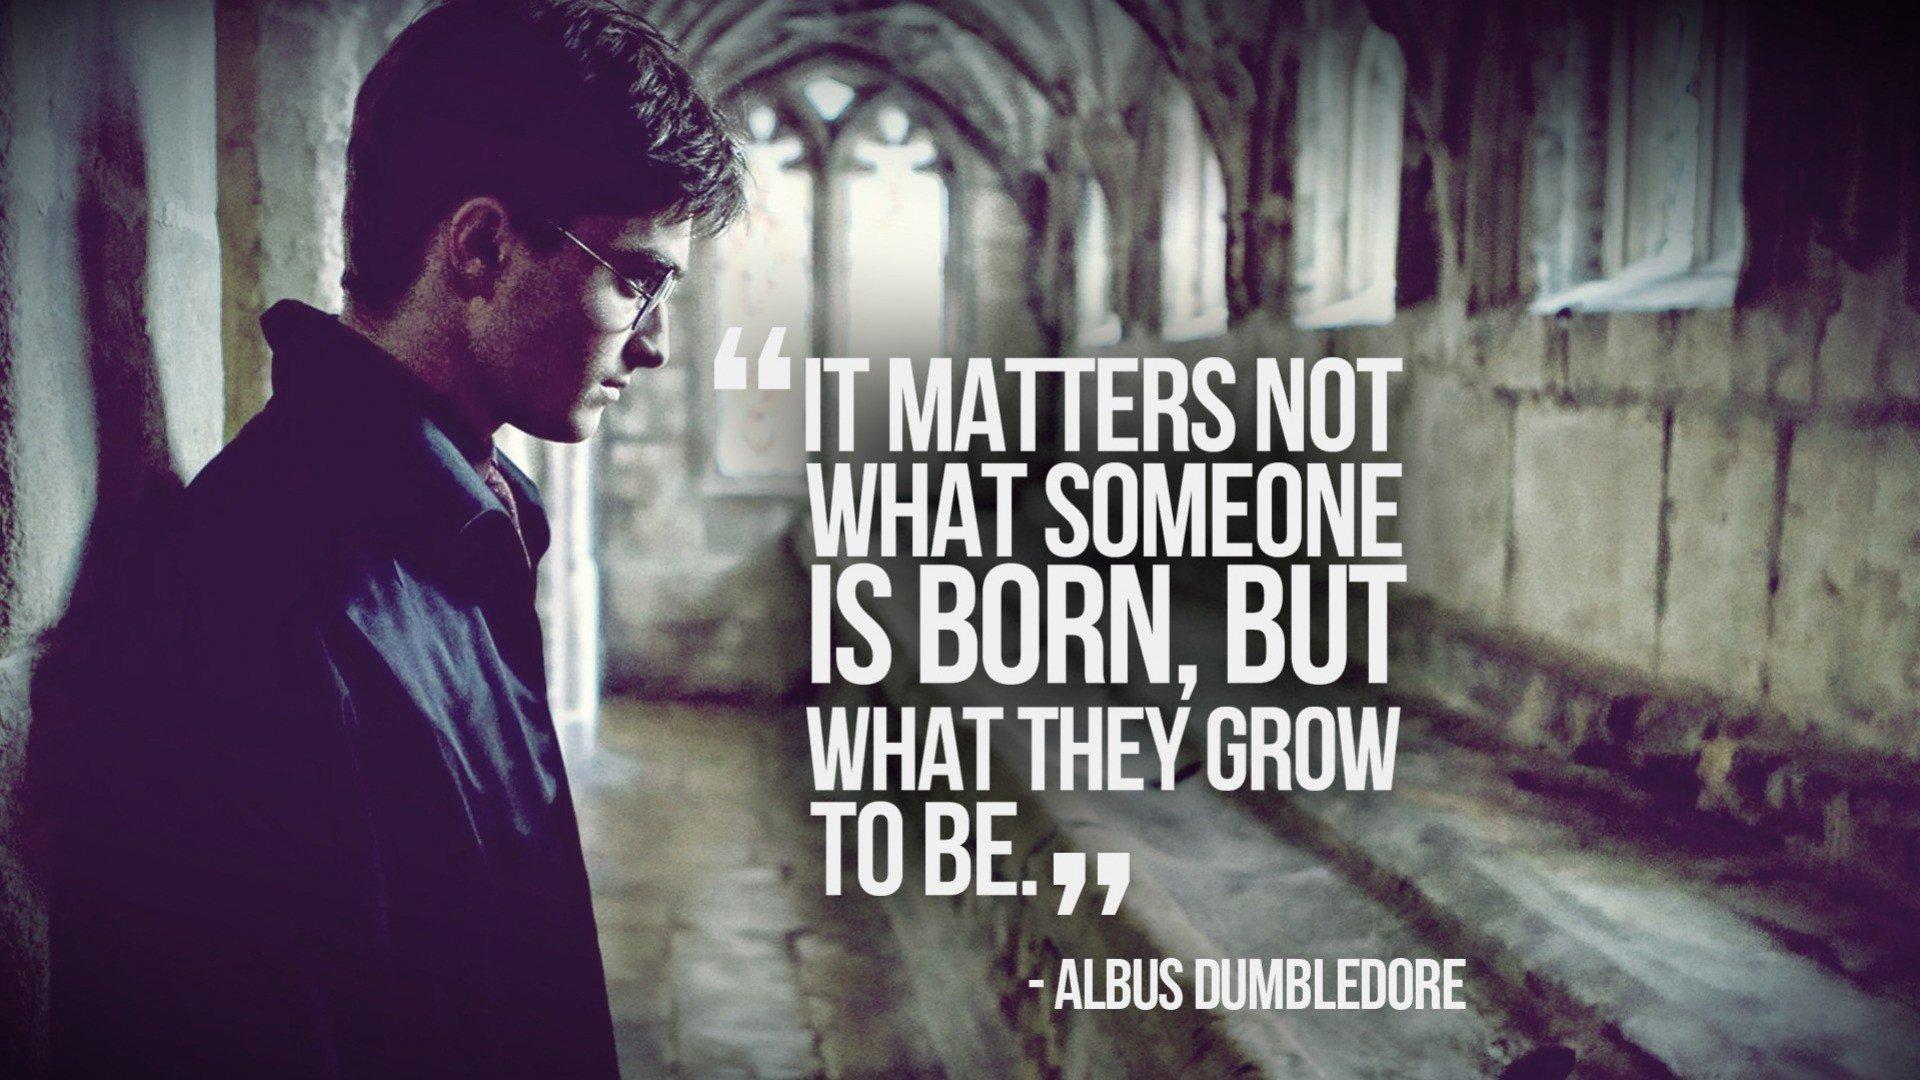 quotes Harry Potter Daniel Radcliffe Albus Dumbledore 1920x1080